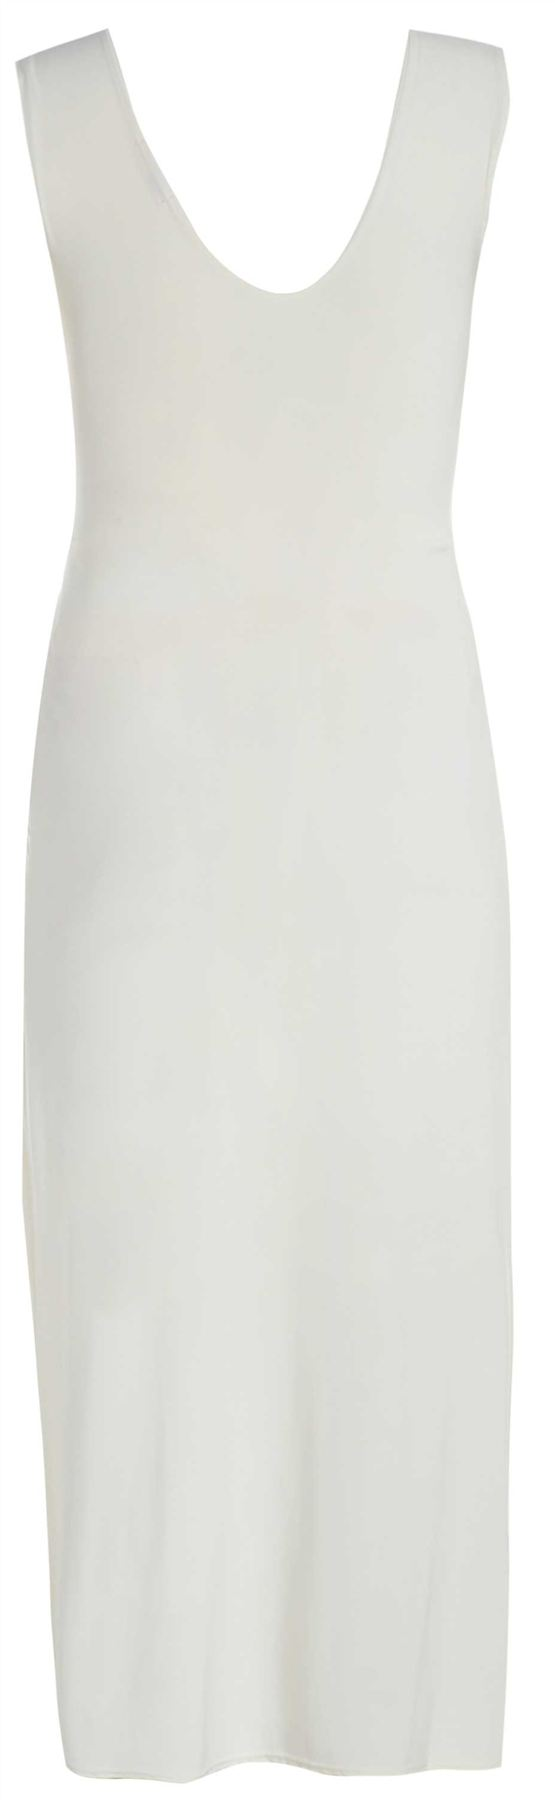 NEU Damen Promi Stil monochrom gestreift maxi kleid rock leggings